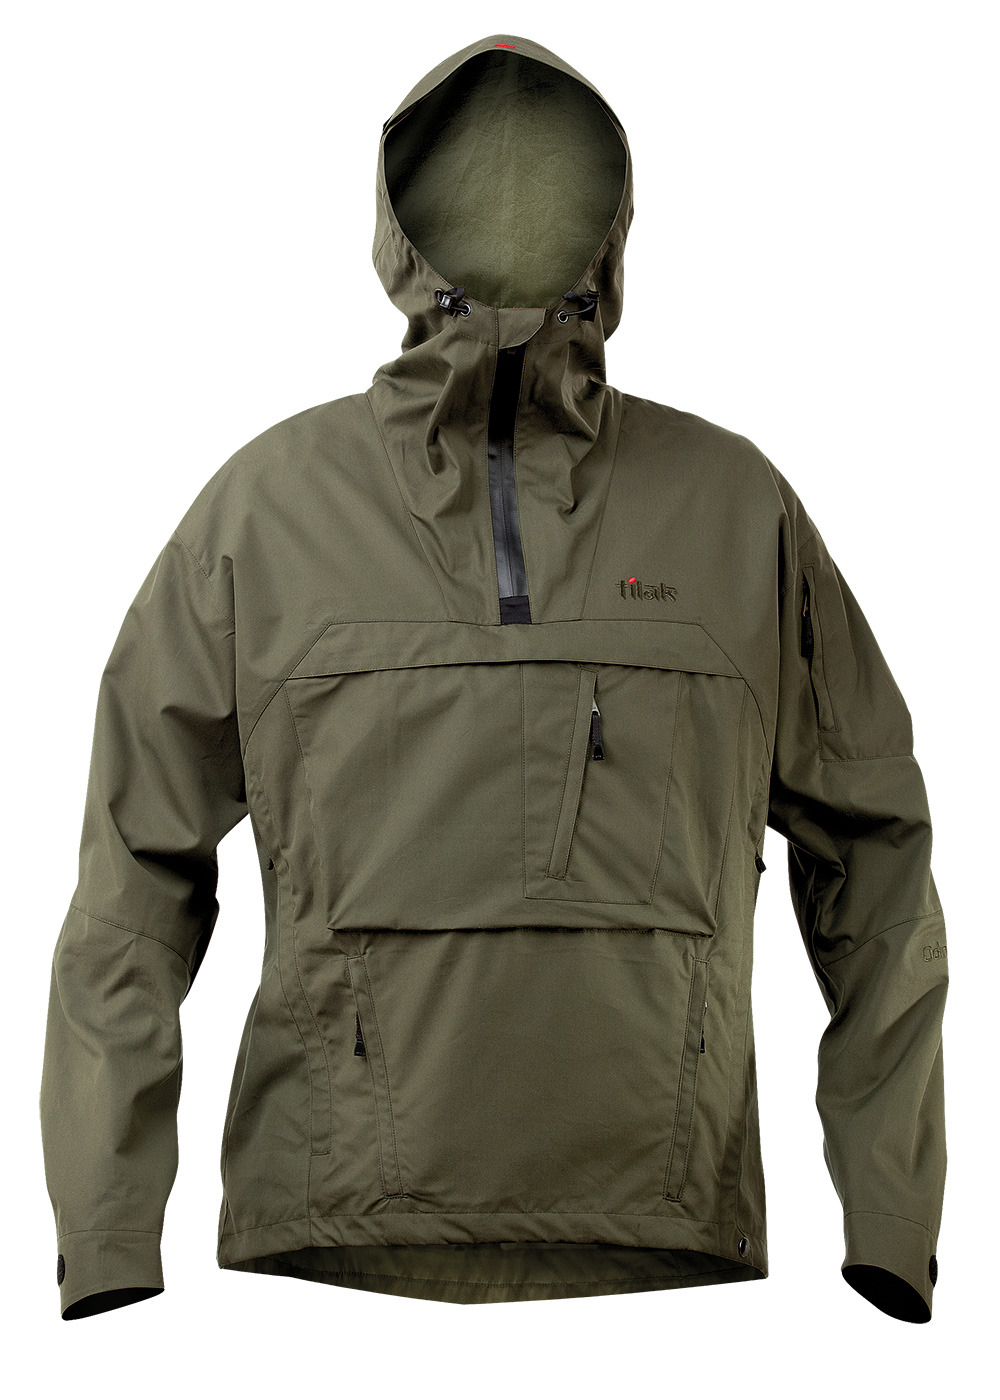 Tilak Odin Anorak Jacket Purchase Online Cheap At Bivvy